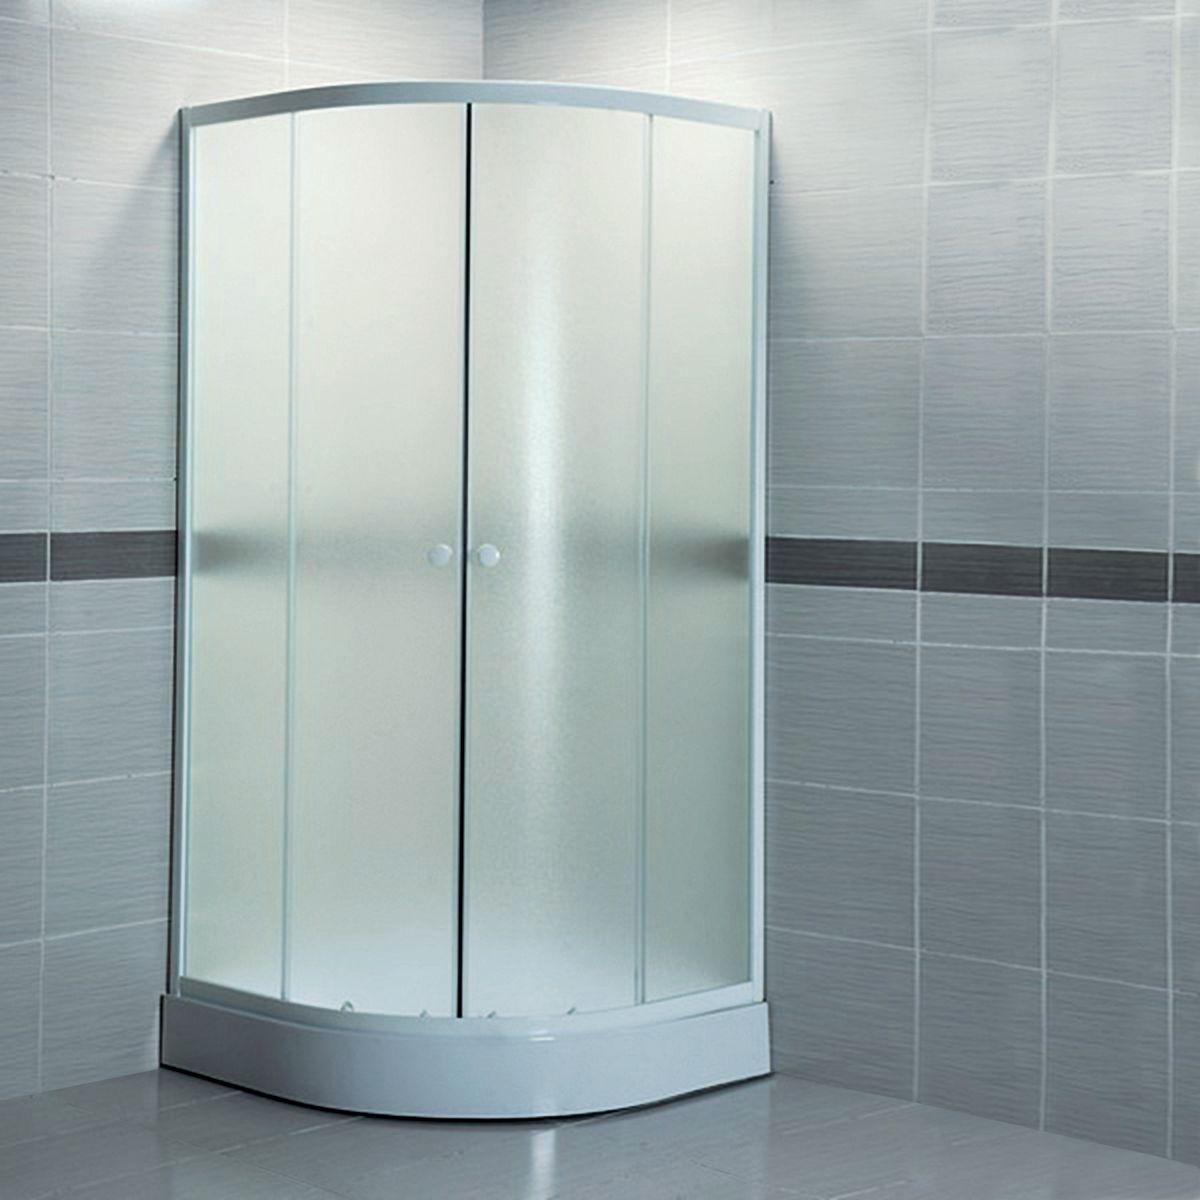 Porte scorrevoli ikea ekuclipo legno luoriginale - Box doccia resina ...